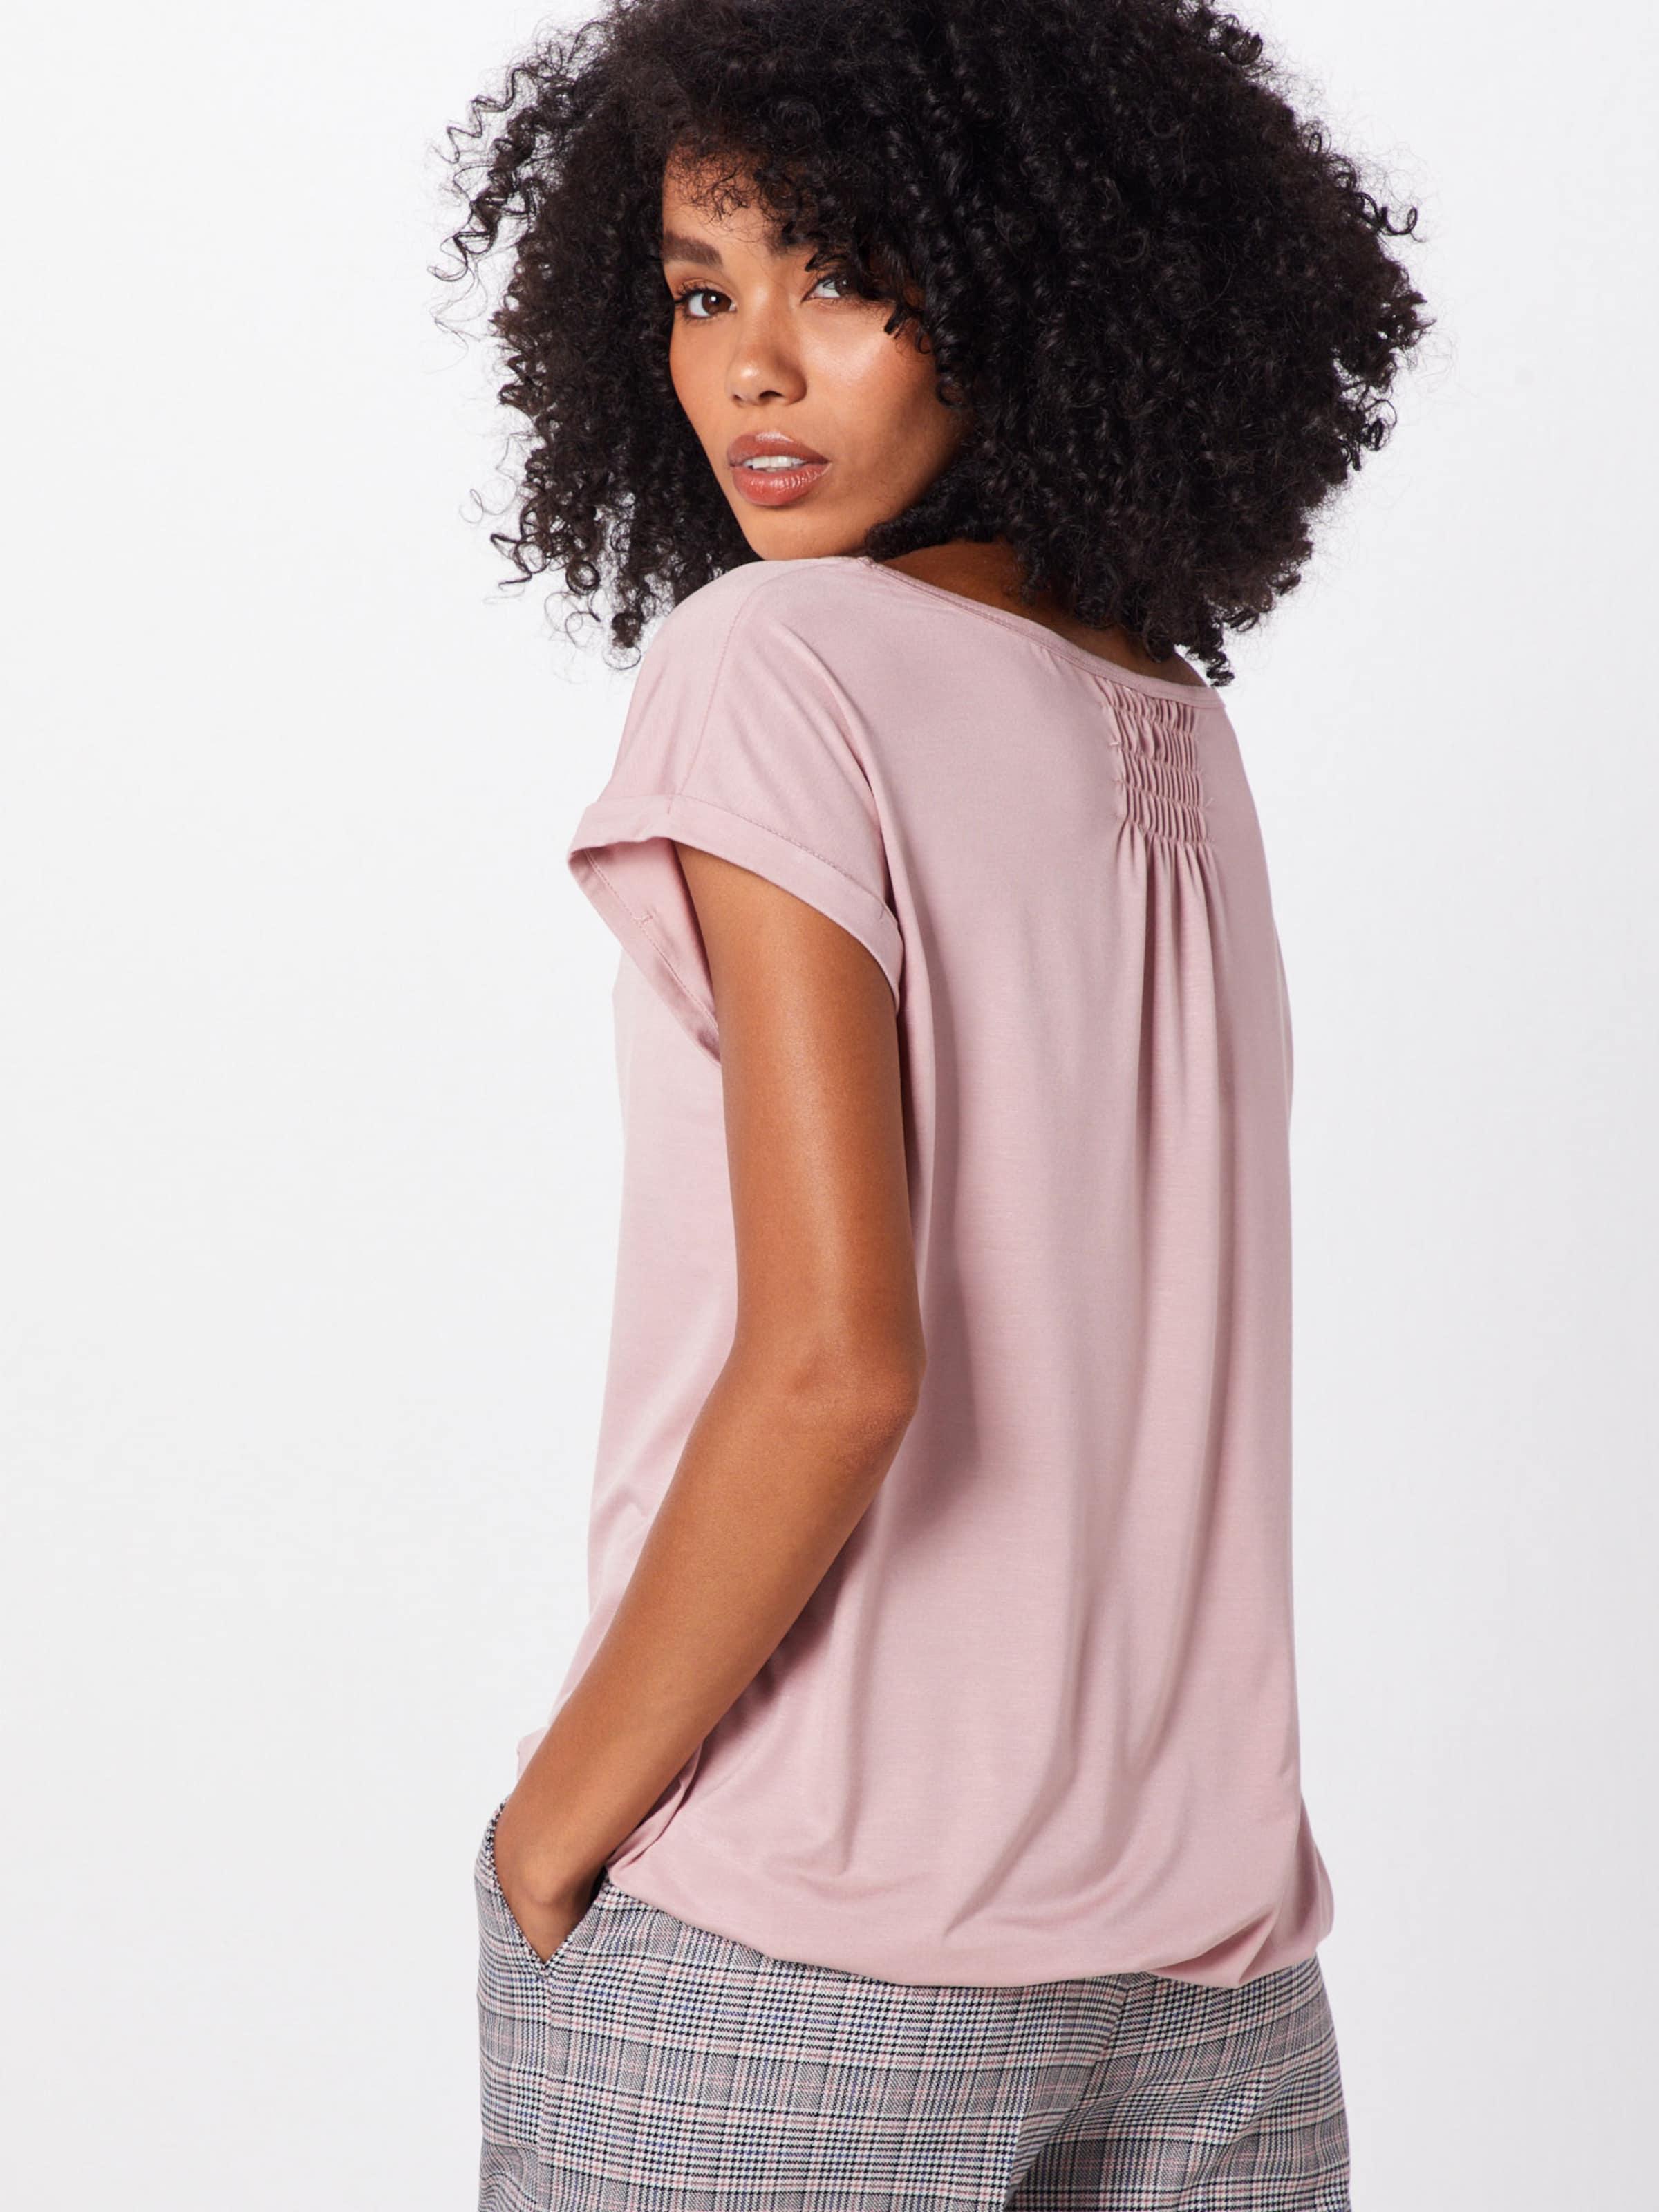 In Soyaconcept Rosa 'marica' Shirt Rosa Soyaconcept 'marica' Shirt Soyaconcept In Yf67vbgy